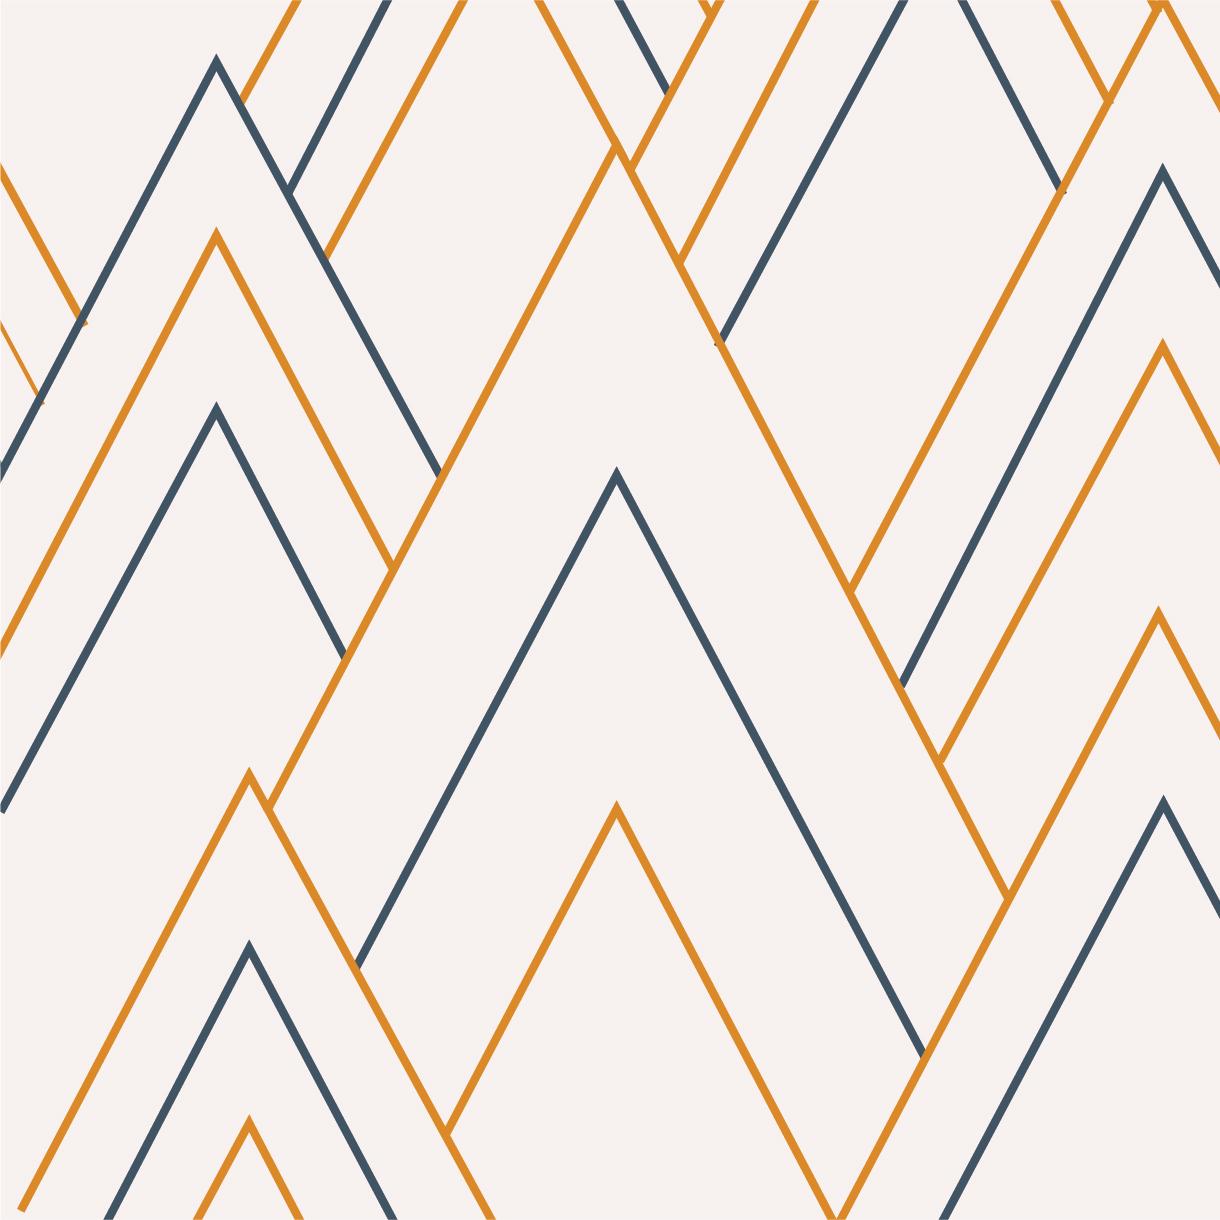 Sugarloaf_Pattern2-01.jpg